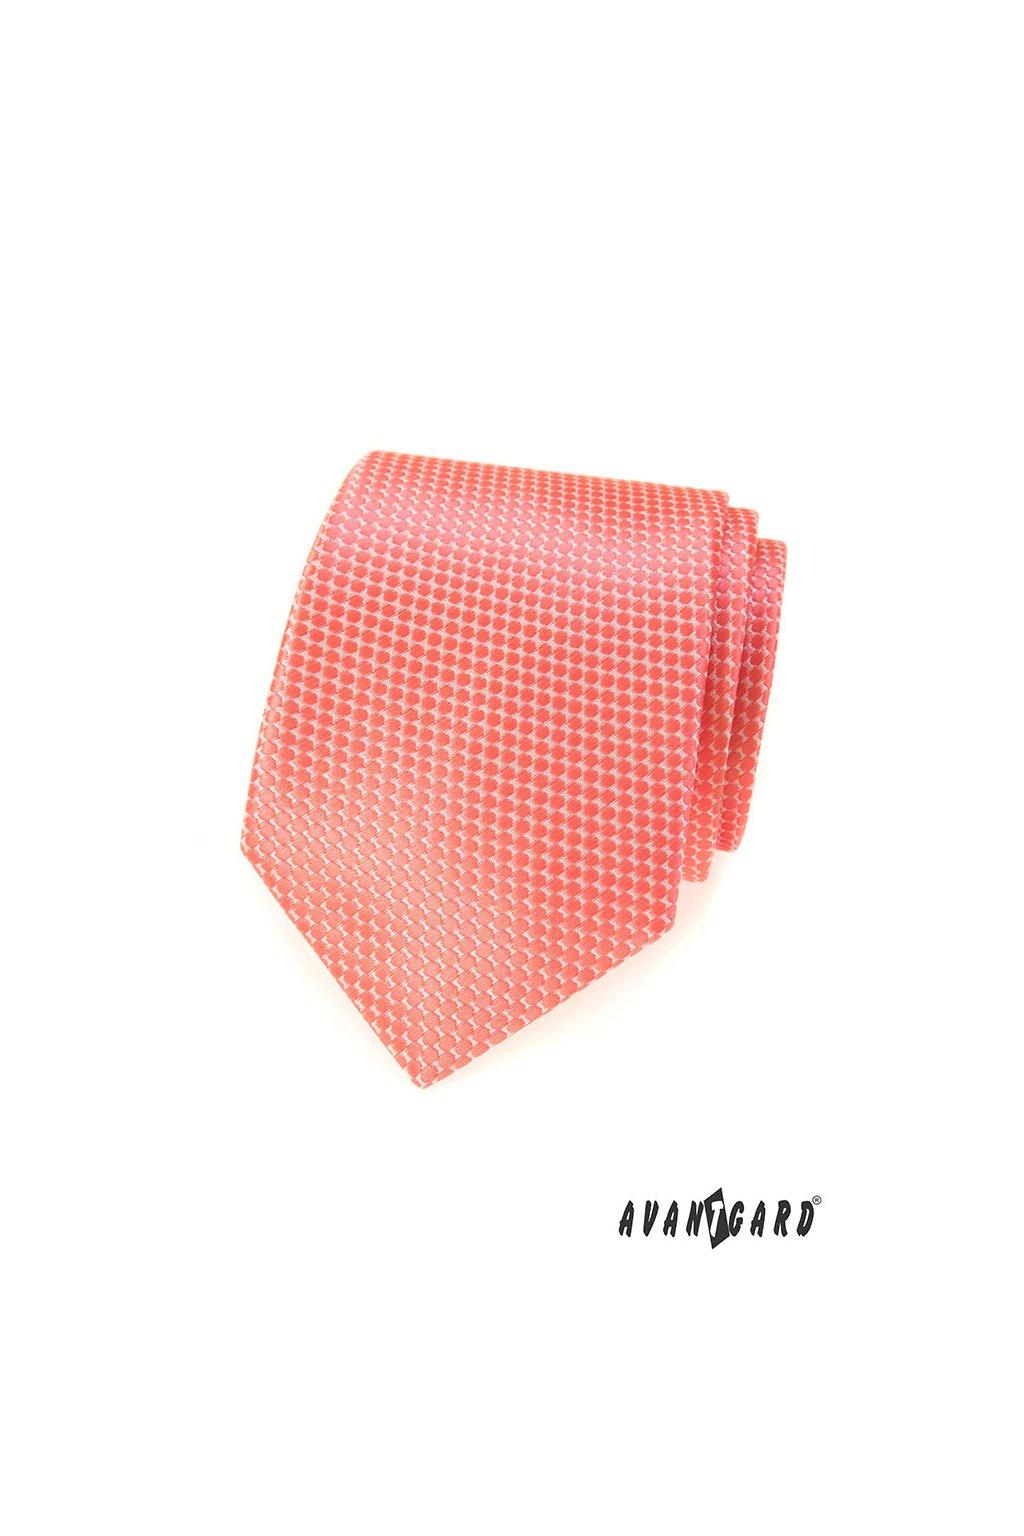 Lososová kravata se vzorkem 559 - 324